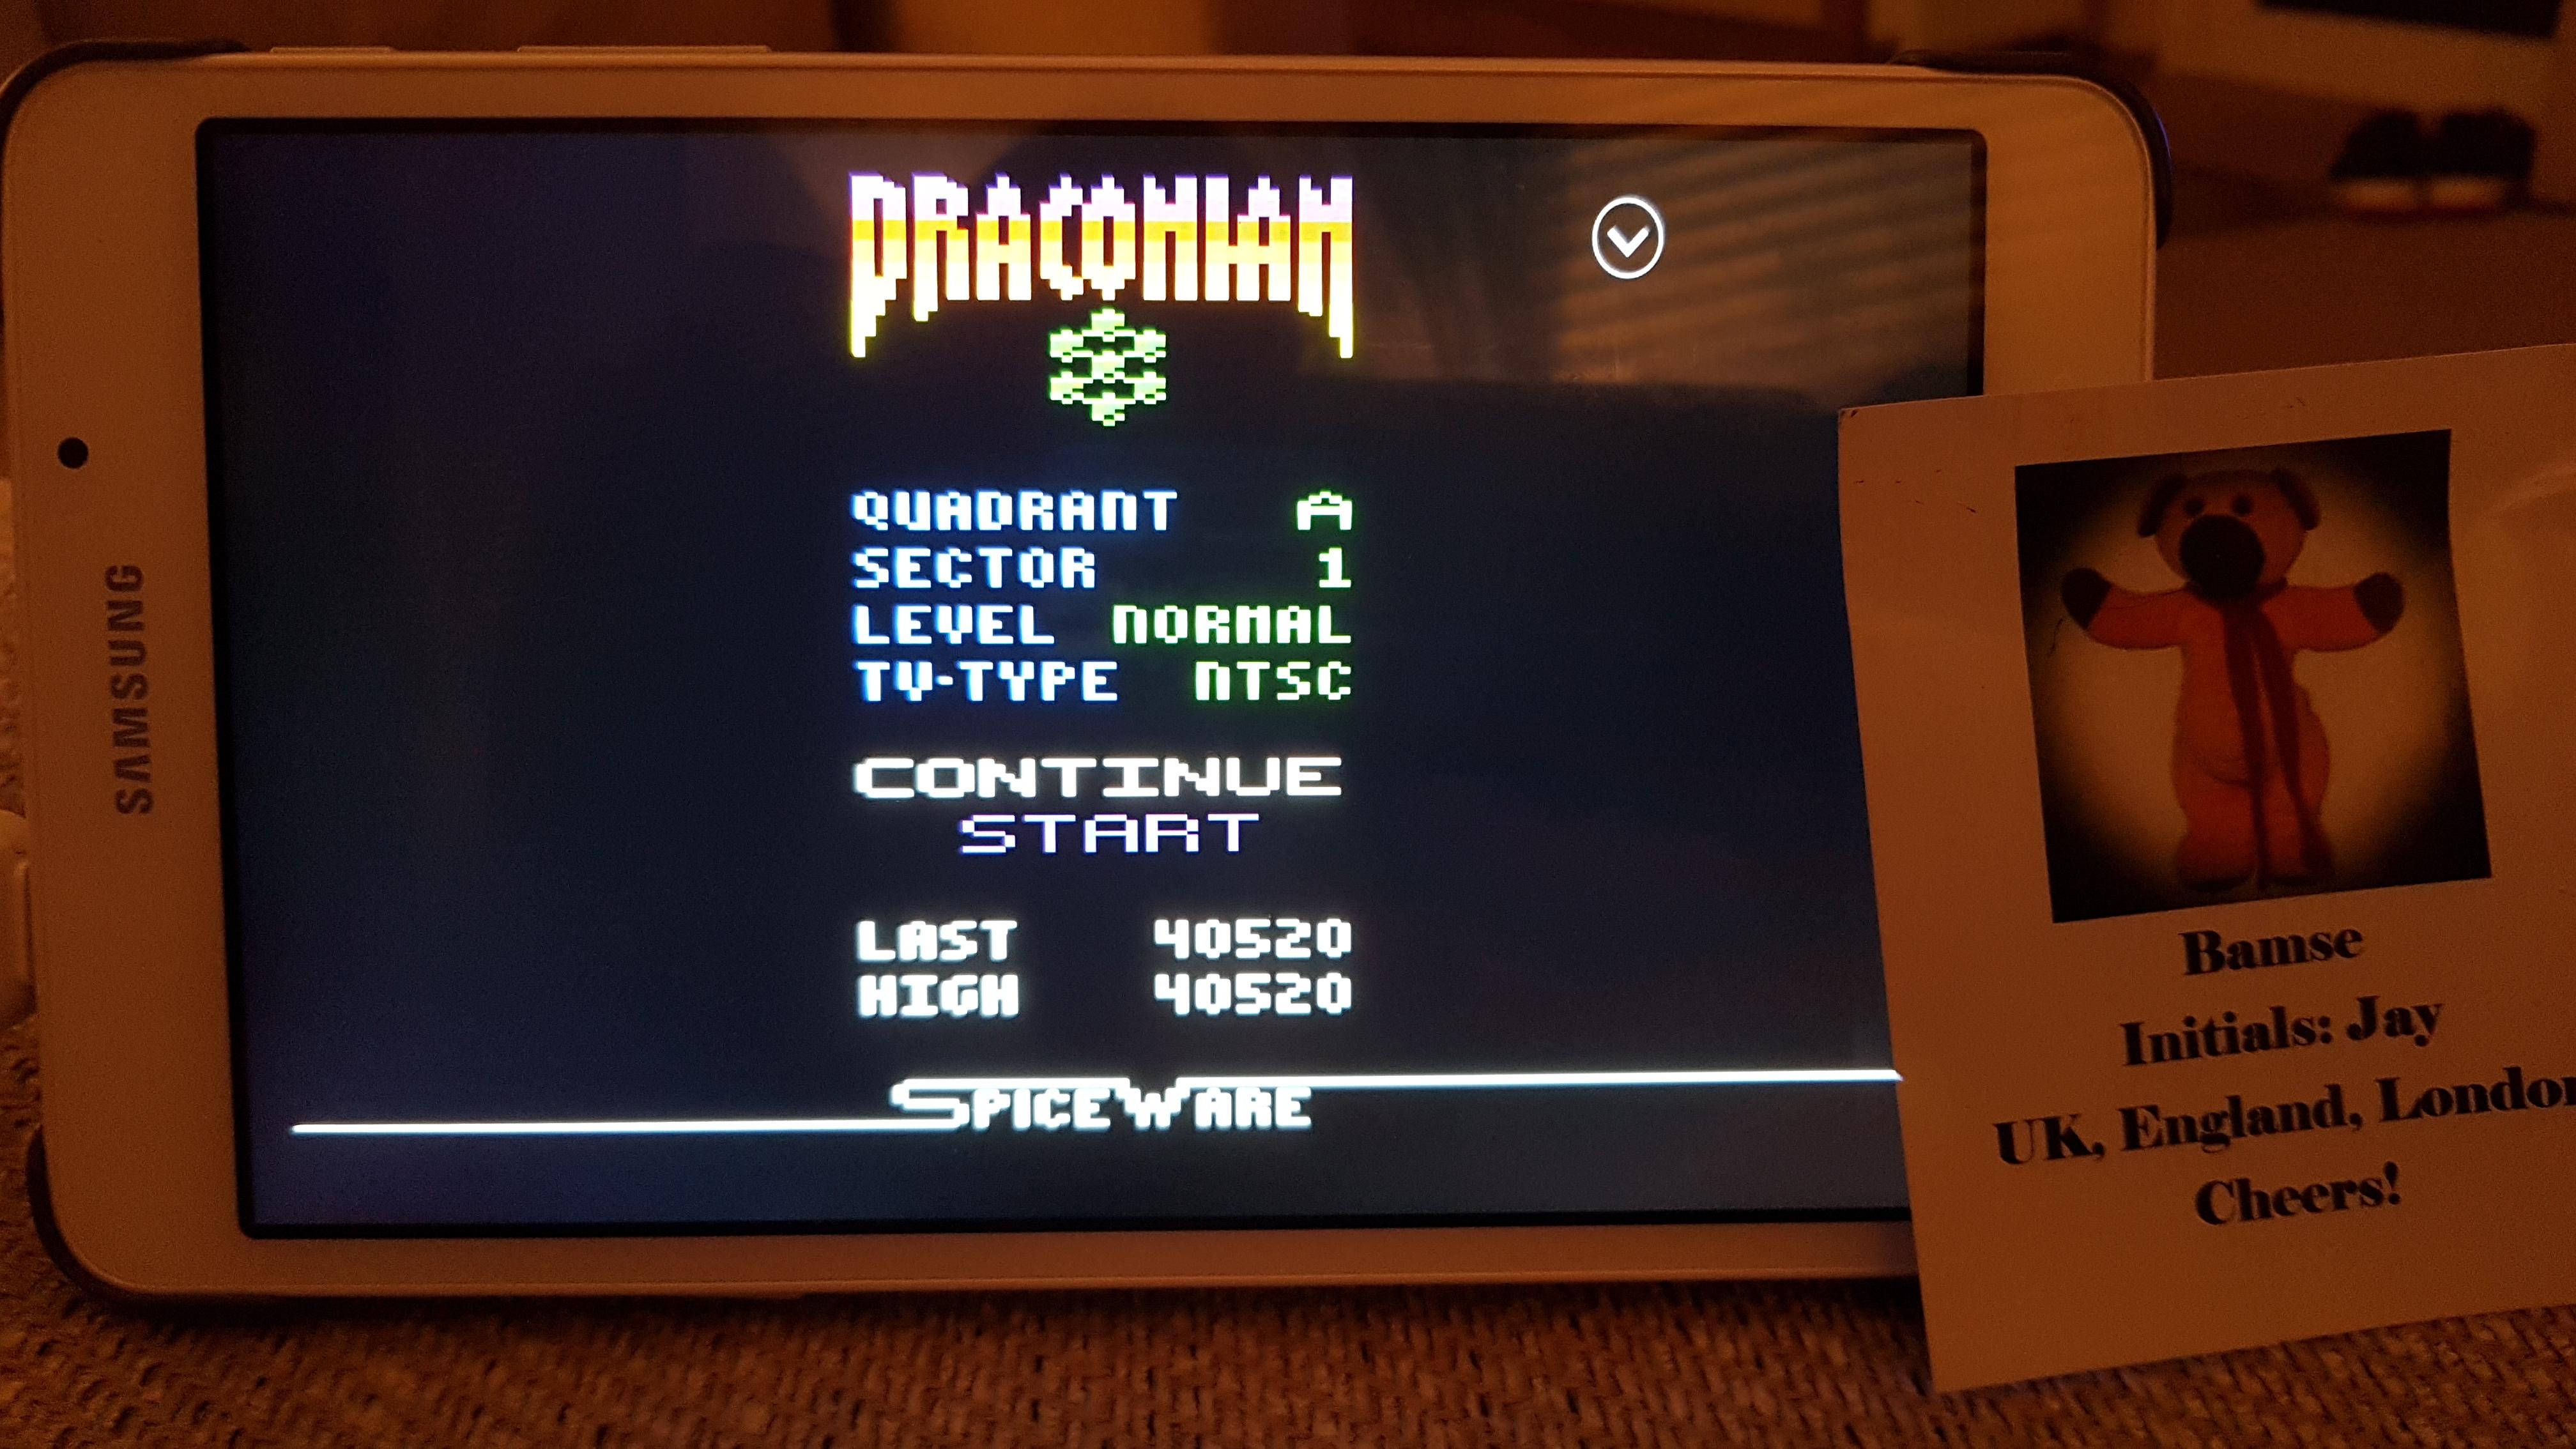 Bamse: Draconian: Quadrant Alpha / Sector 1 [Normal] (Atari 2600 Emulated) 40,520 points on 2019-07-01 18:10:29